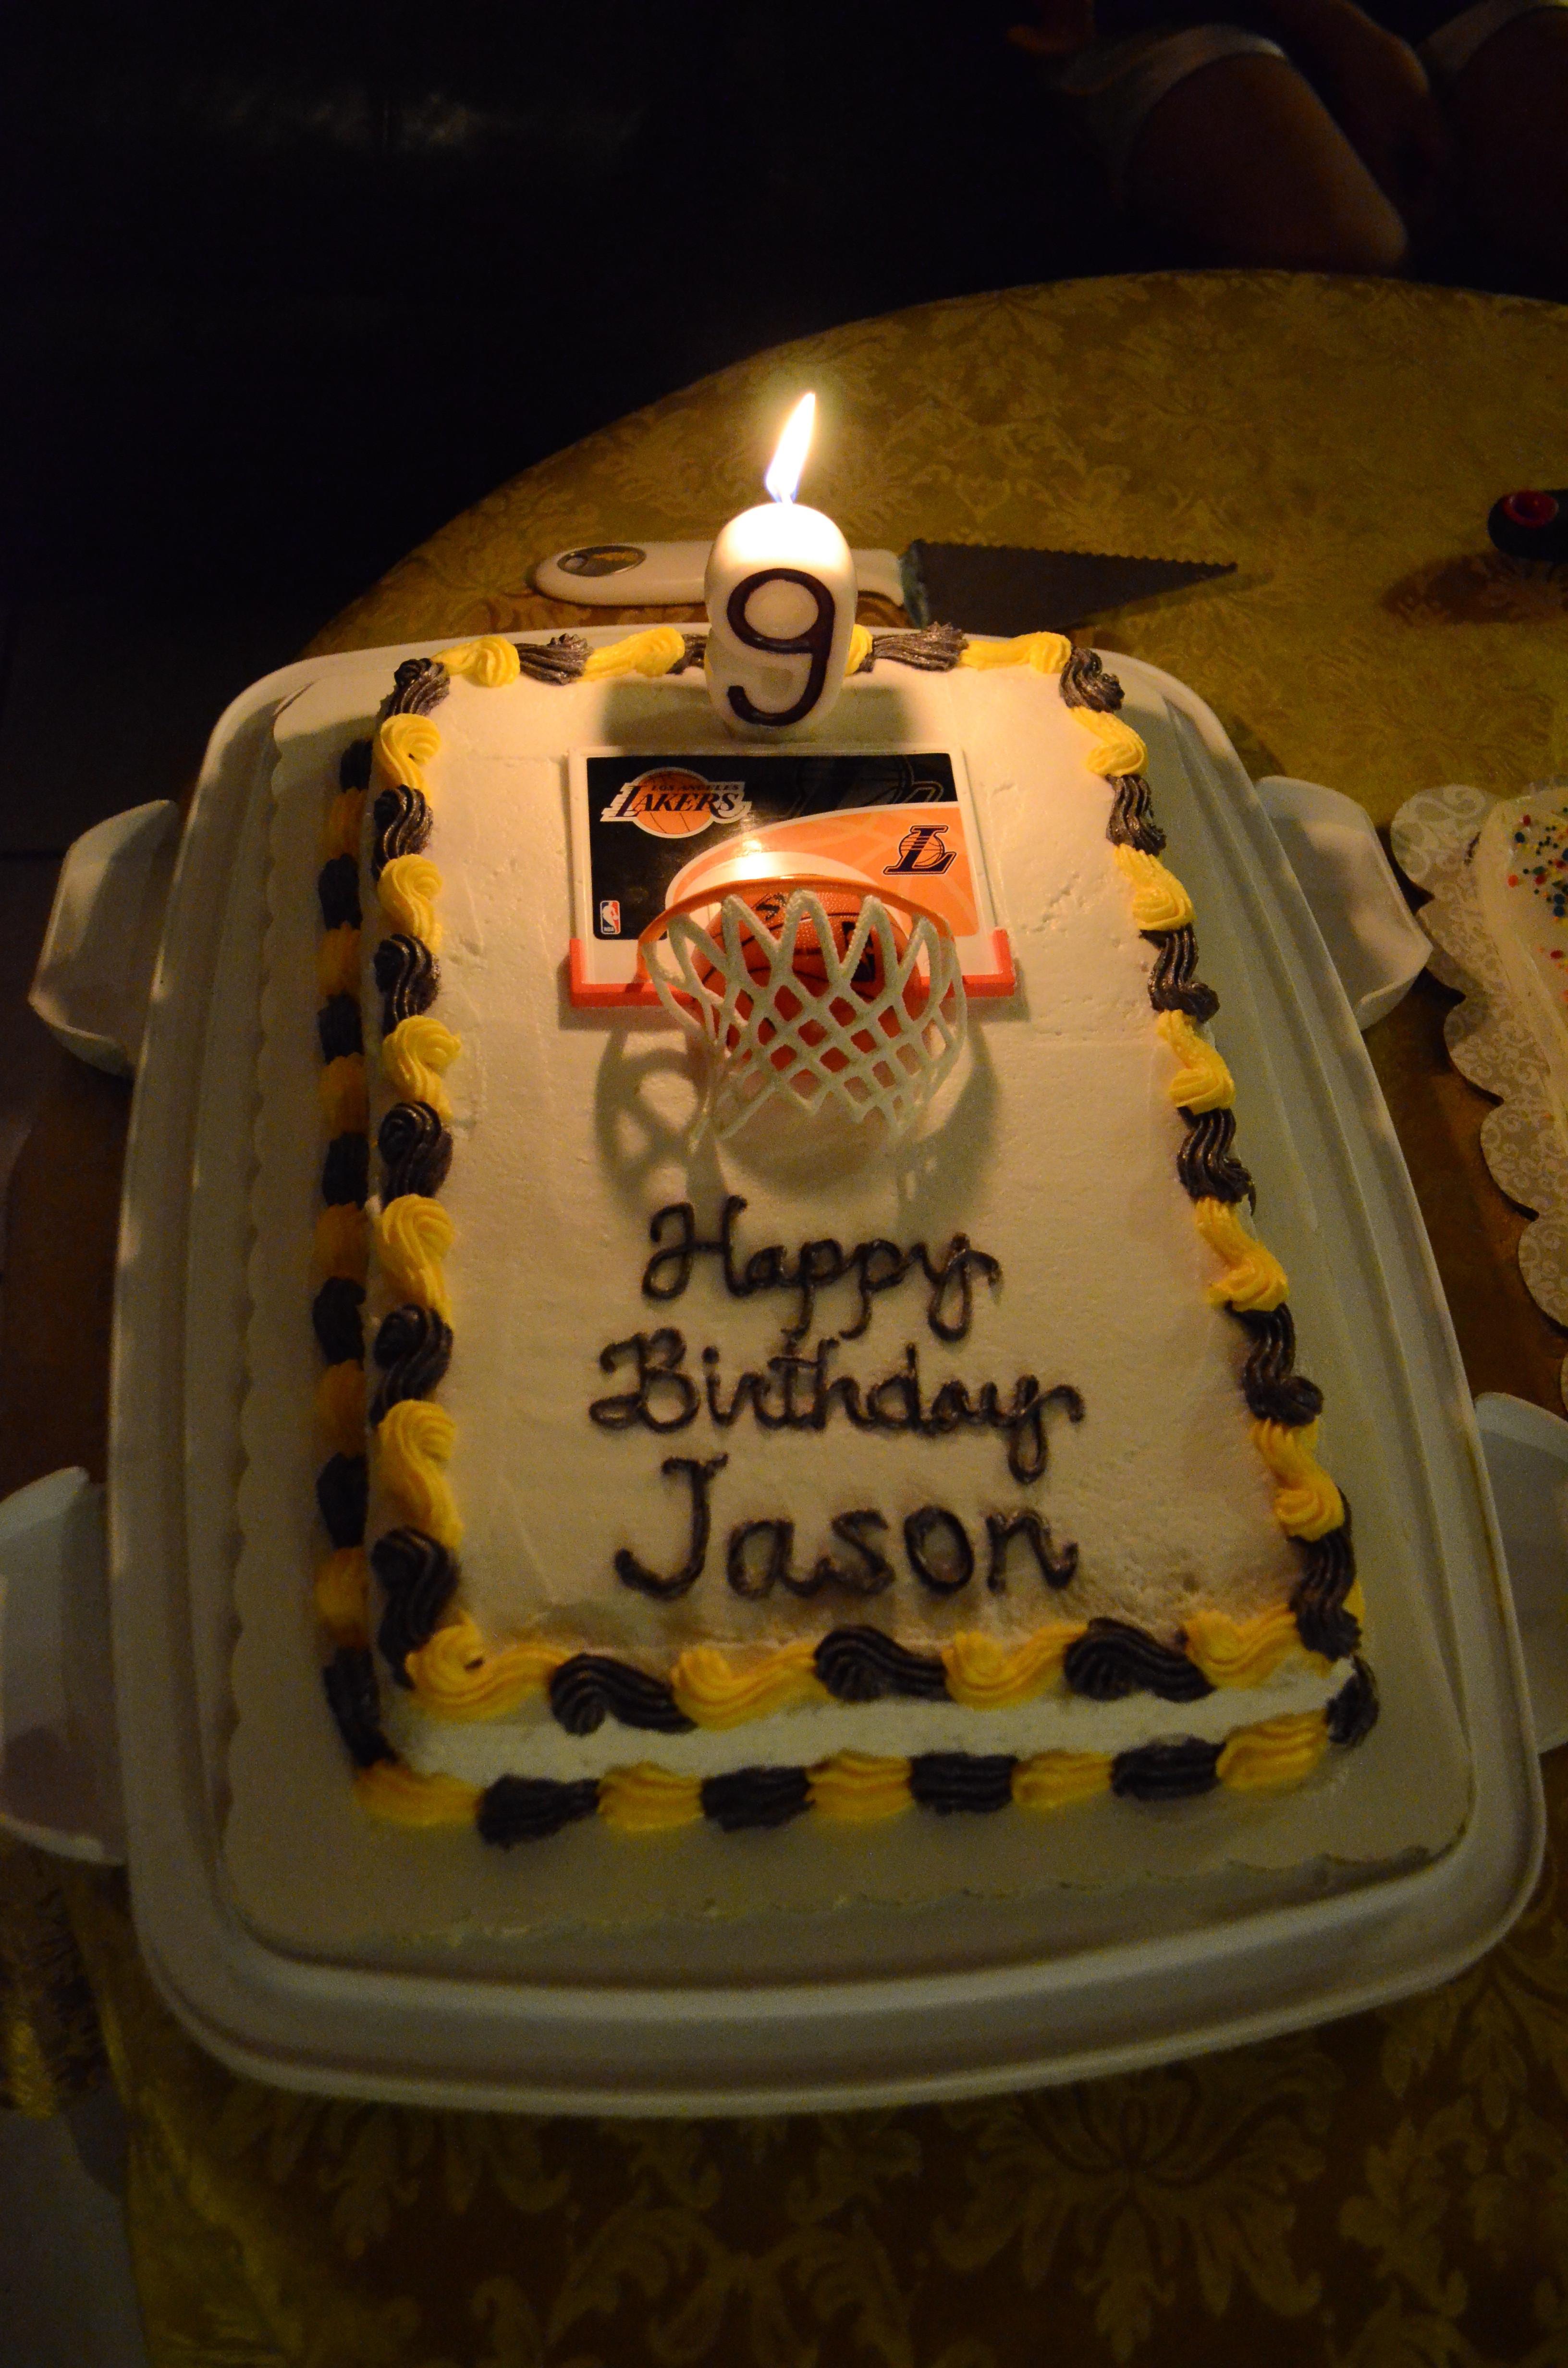 Best ideas about Happy Birthday Jason Cake . Save or Pin Happy Birthday Jason Lakers Cake CakeCentral Now.